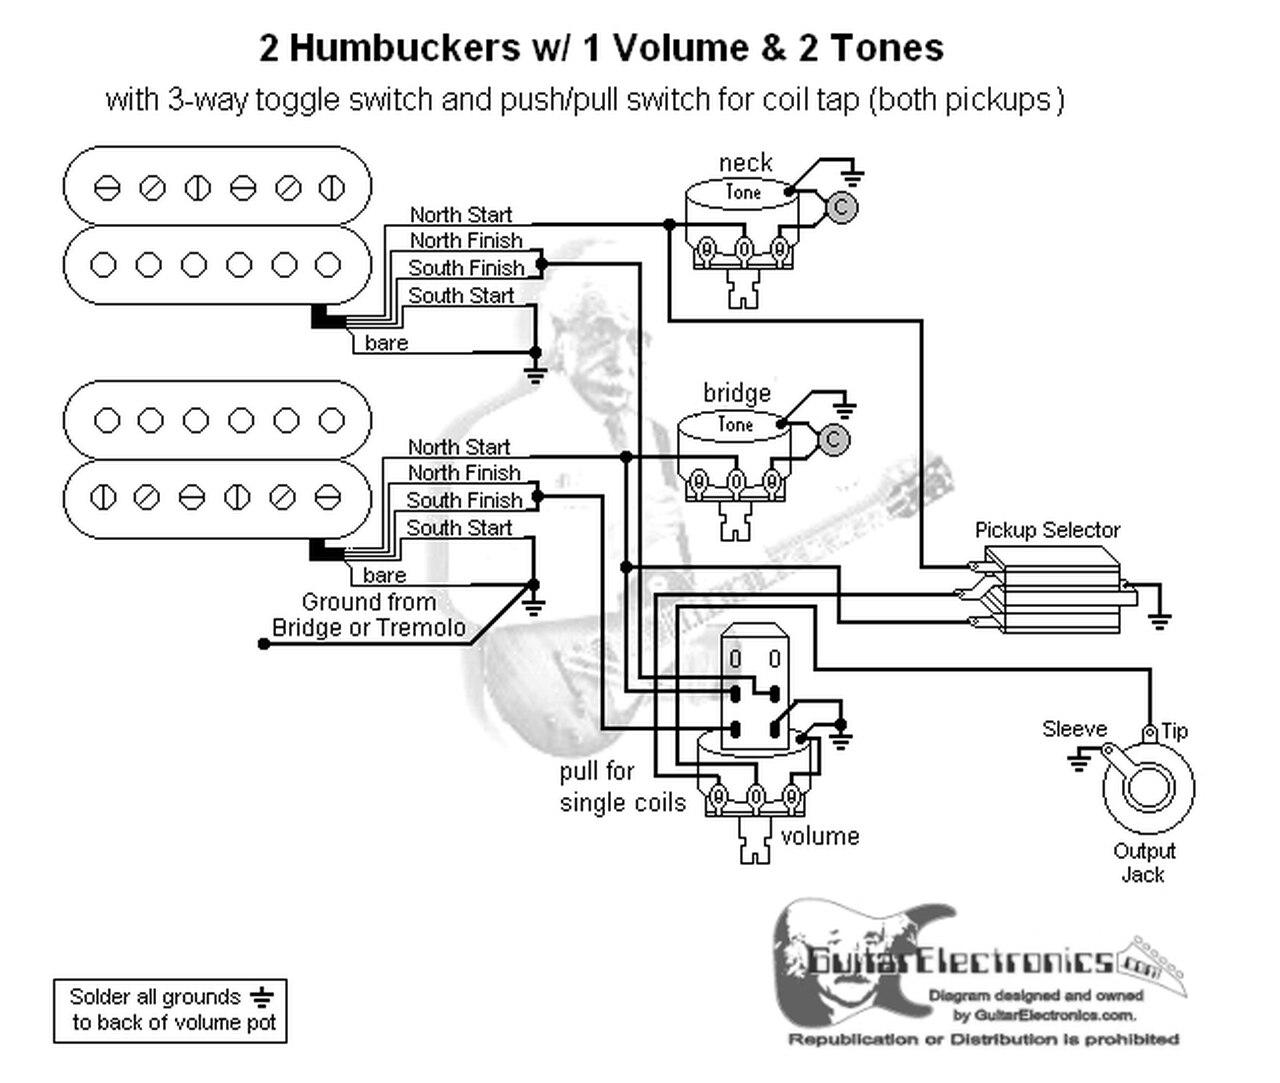 Ov 2 Humbucker Wiring Diagrams 1 Volume 1tone